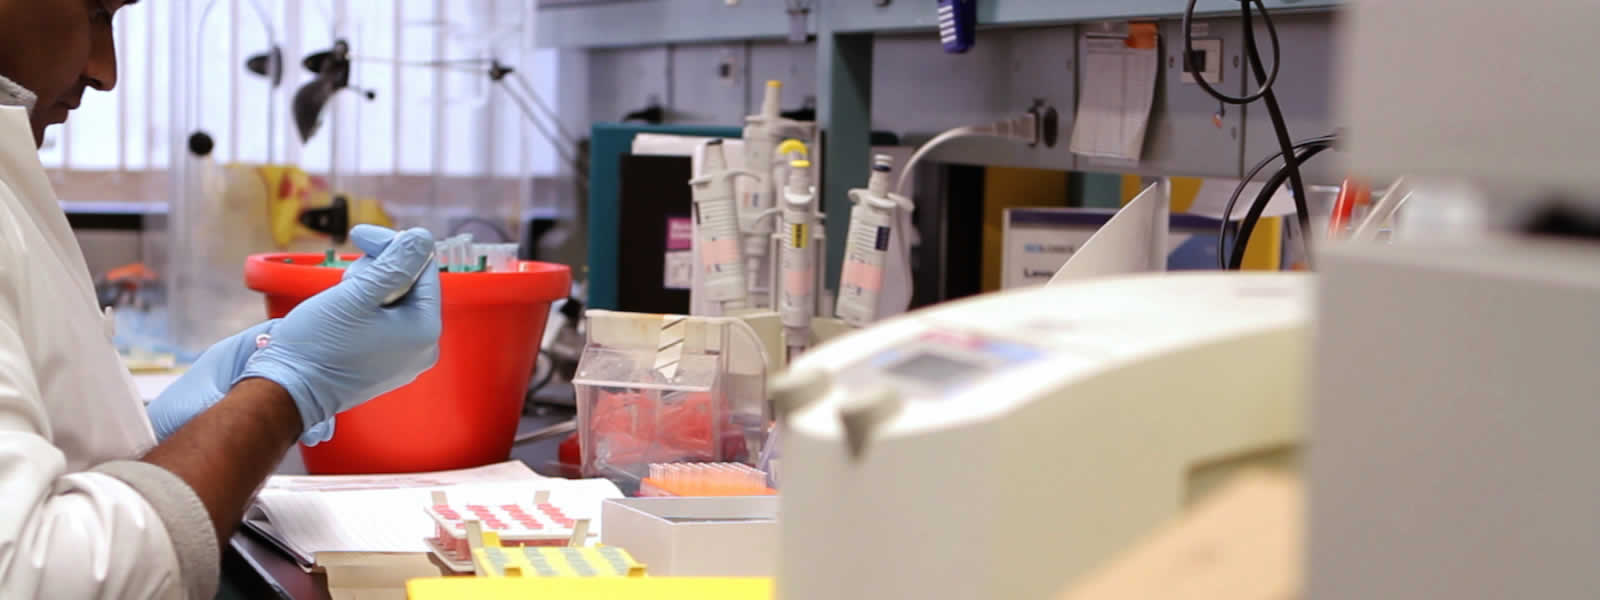 Key Industry: Life Sciences